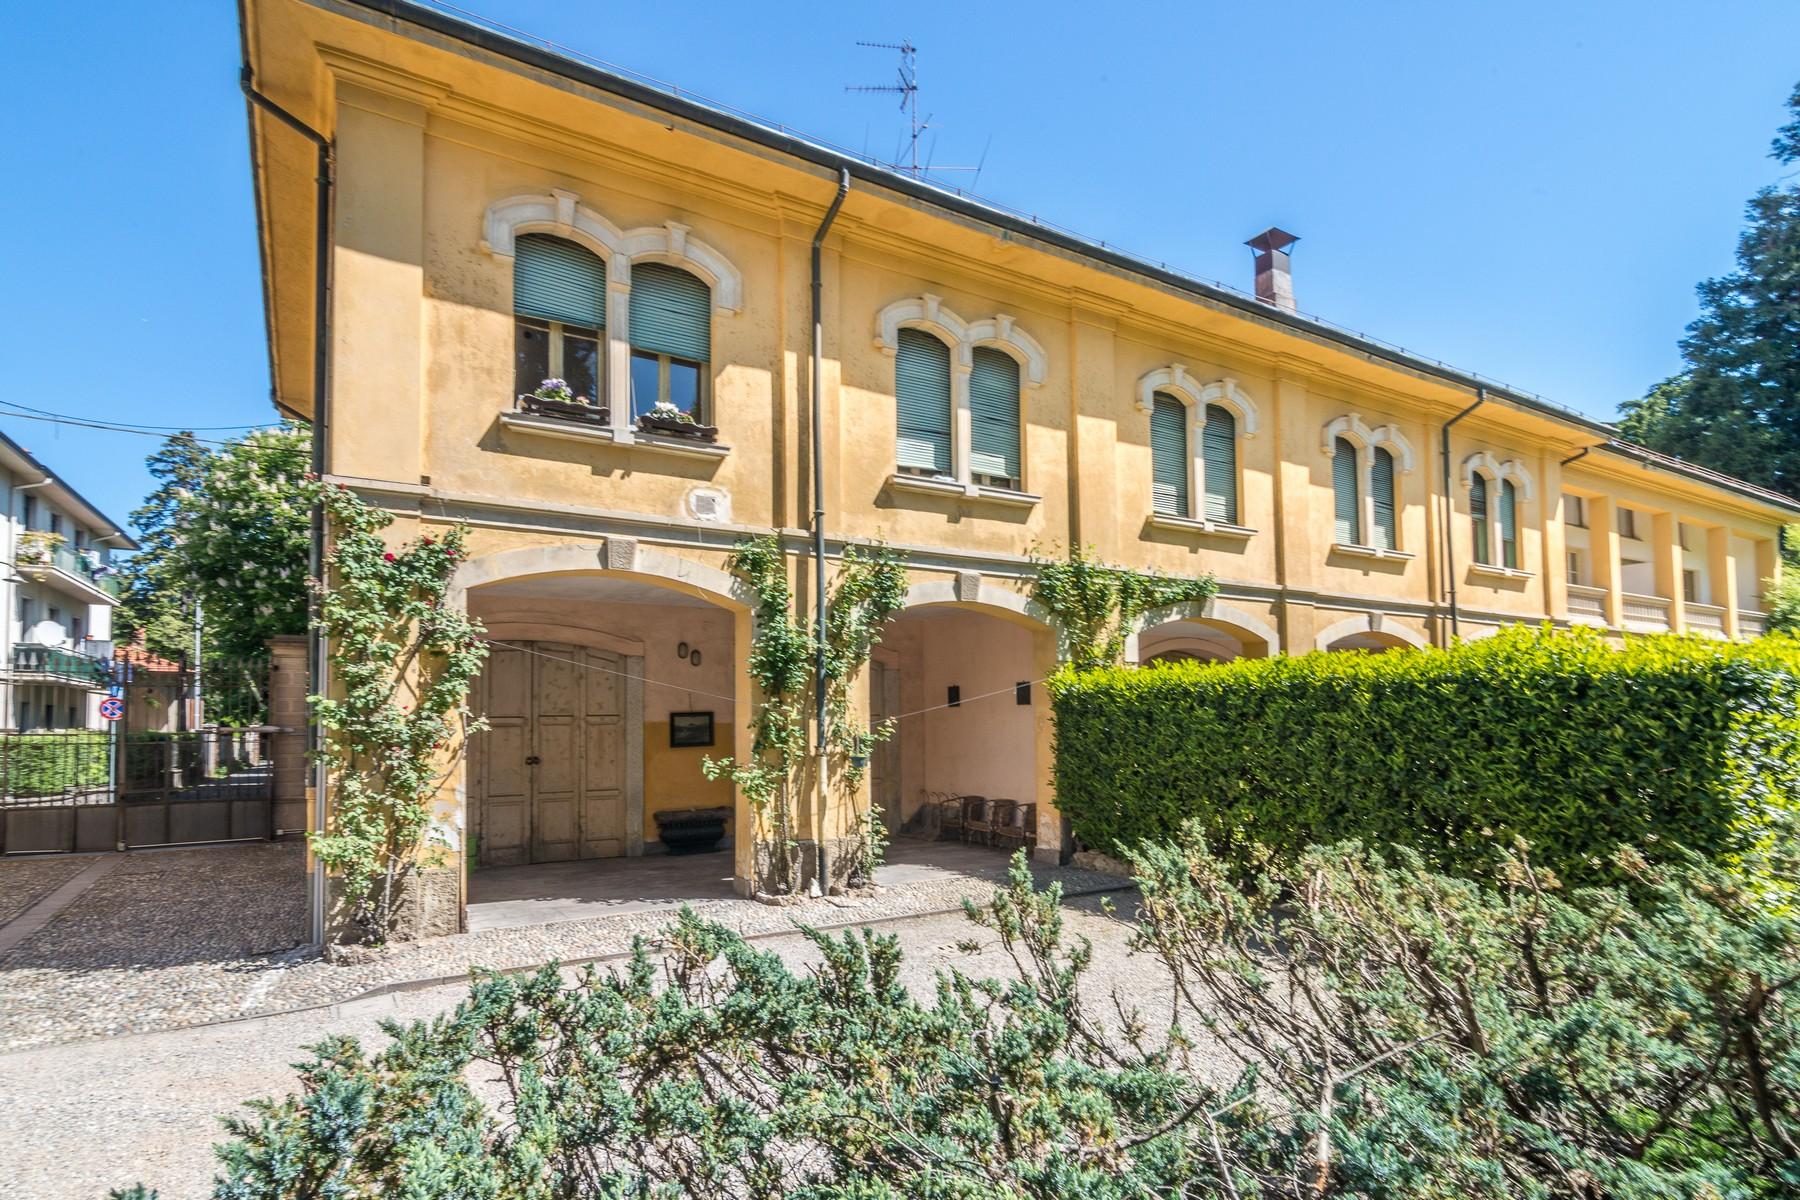 Villa in Vendita a Varese: 5 locali, 1500 mq - Foto 18